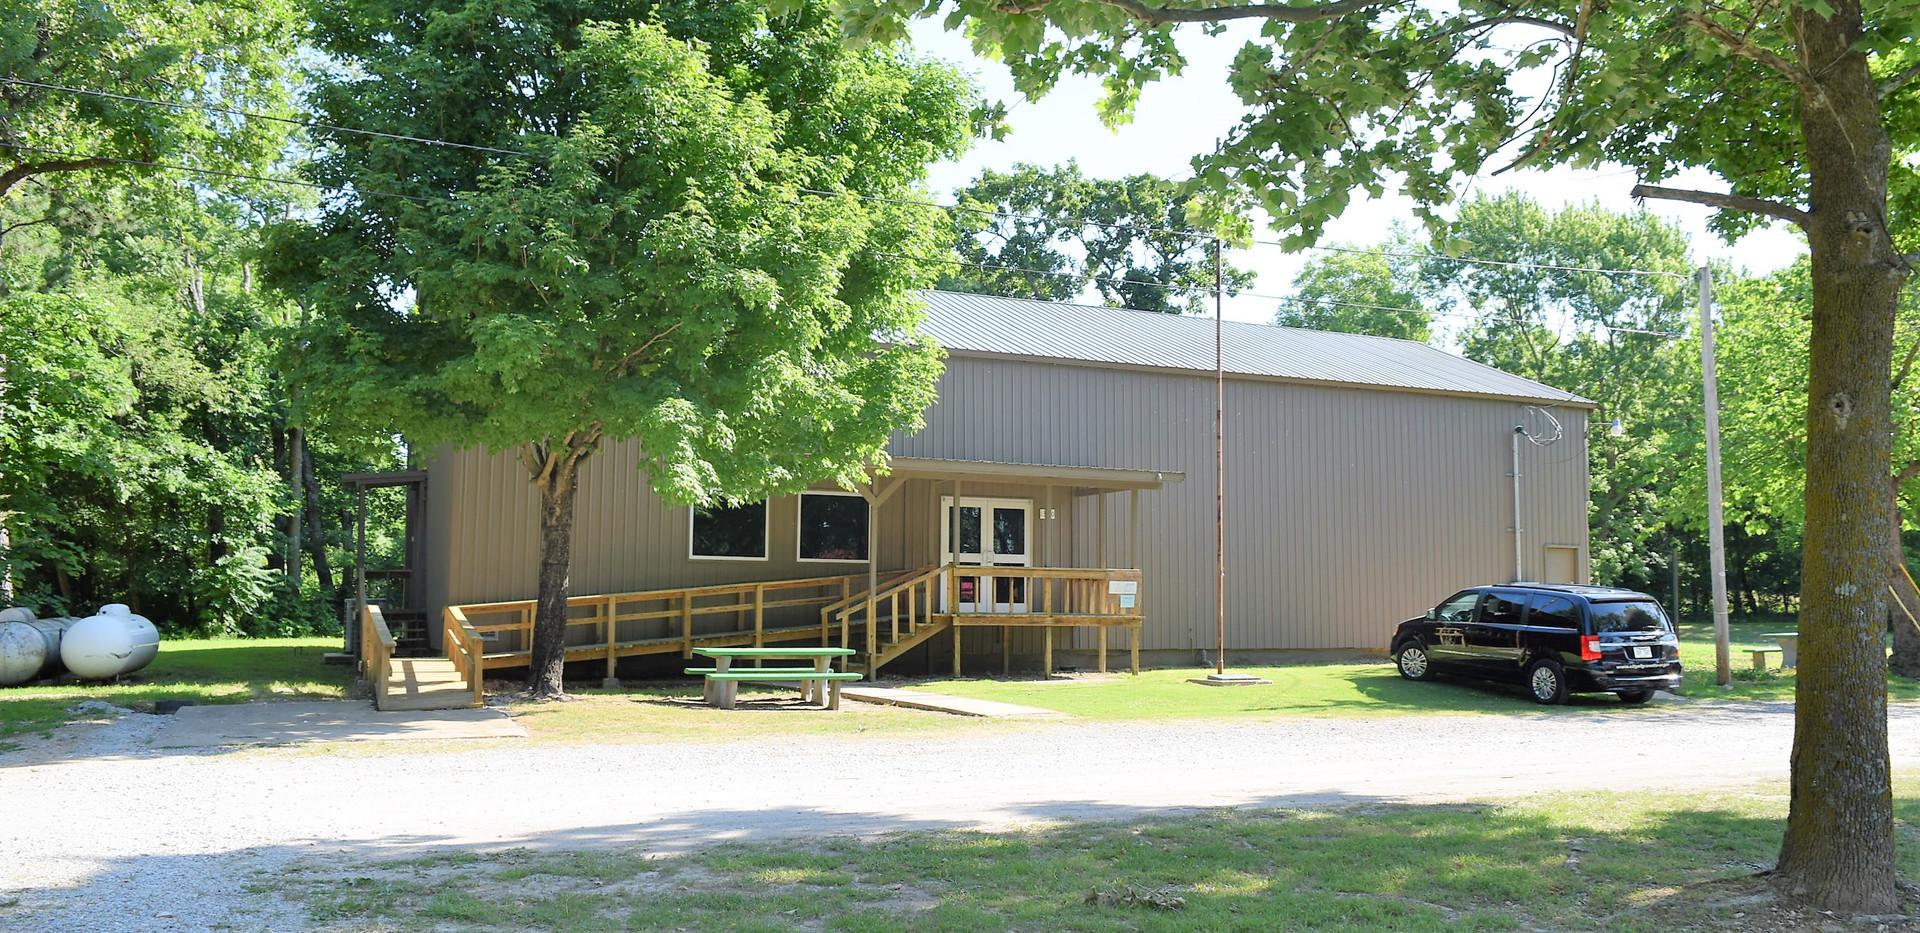 Hiwasse Community Building